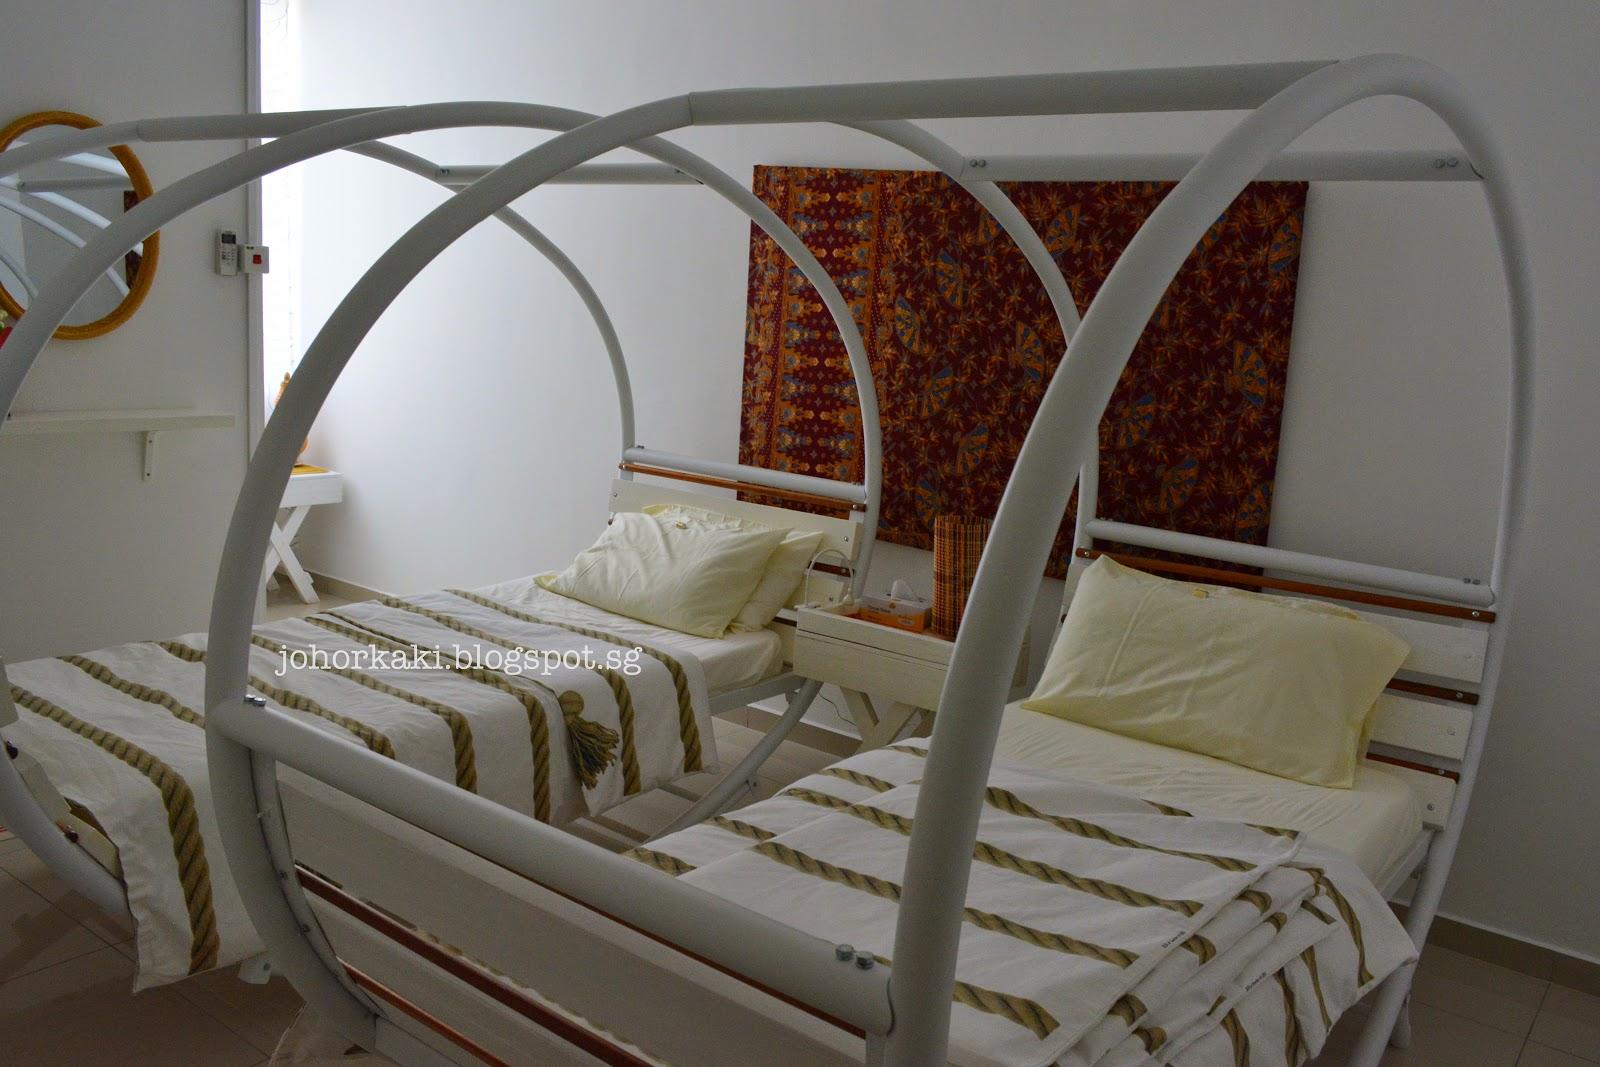 Eco b b bed breakfast homestay johor bahru jk1103 johor for Sofa bed johor bahru